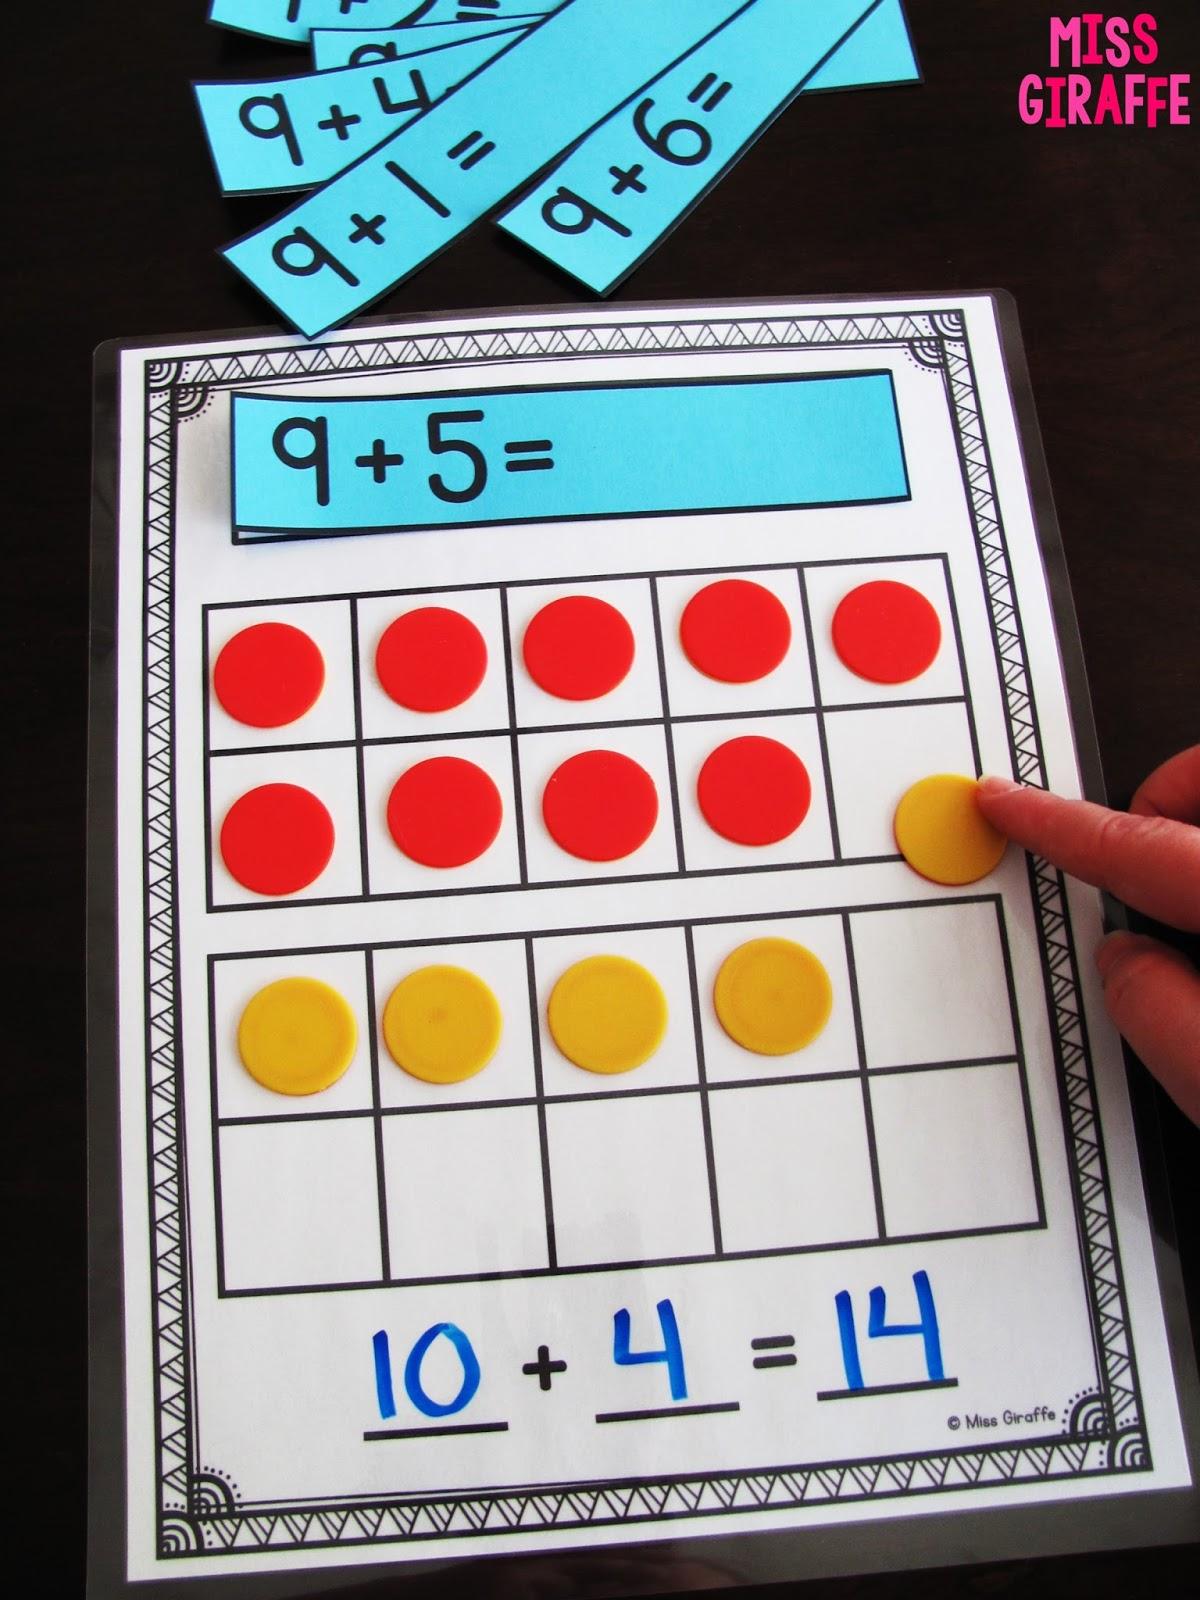 Miss Giraffe's Class: Making a 10 to Add